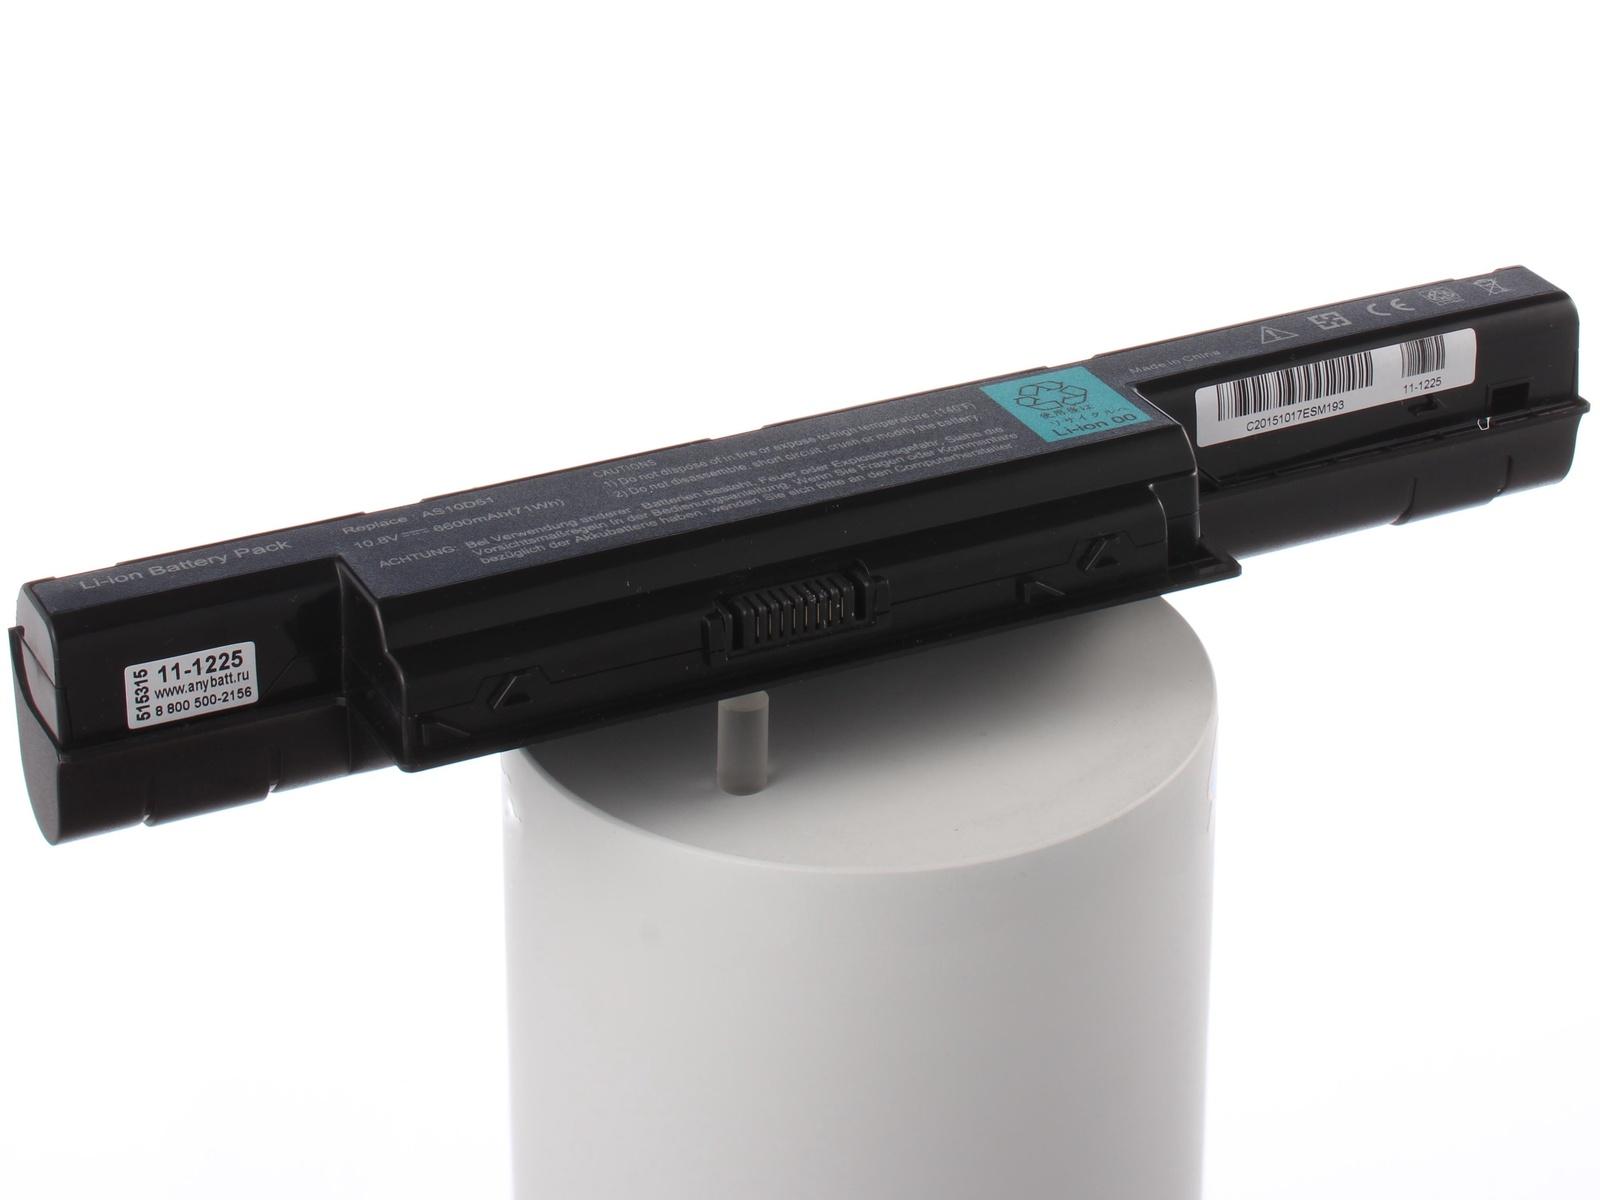 Аккумулятор для ноутбука AnyBatt для Acer Aspire 7750G-2414G50Mikk, Aspire E1-531-B822G32Mnks, Aspire E1-531G-B9804G50Mnks, Aspire E1-571G-B9704G50Mnks, Aspire V3-571G-32374G50Makk, Aspire V3-771G-53214G75Makk аккумулятор для ноутбука anybatt для acer aspire 7750g 2354g64mnkk aspire 7750zg b962g32mnkk aspire e1 530 21174g75mn aspire e1 531 b822g50mnks aspire e1 531g b9604g75ma aspire e1 570 33214g75mnkk aspire e1 571 33114g50mnks